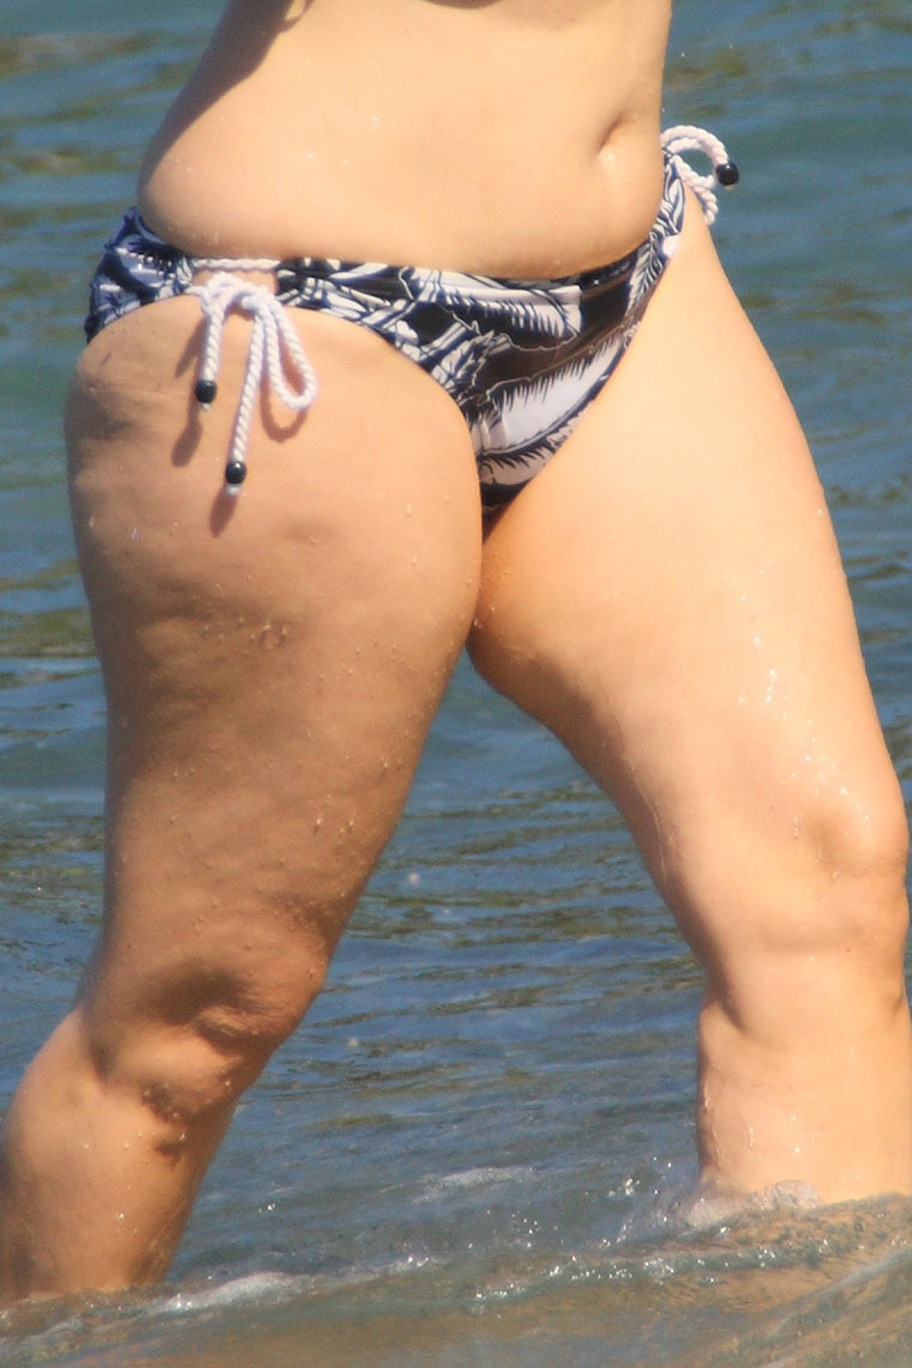 fran dreshner bikini pics